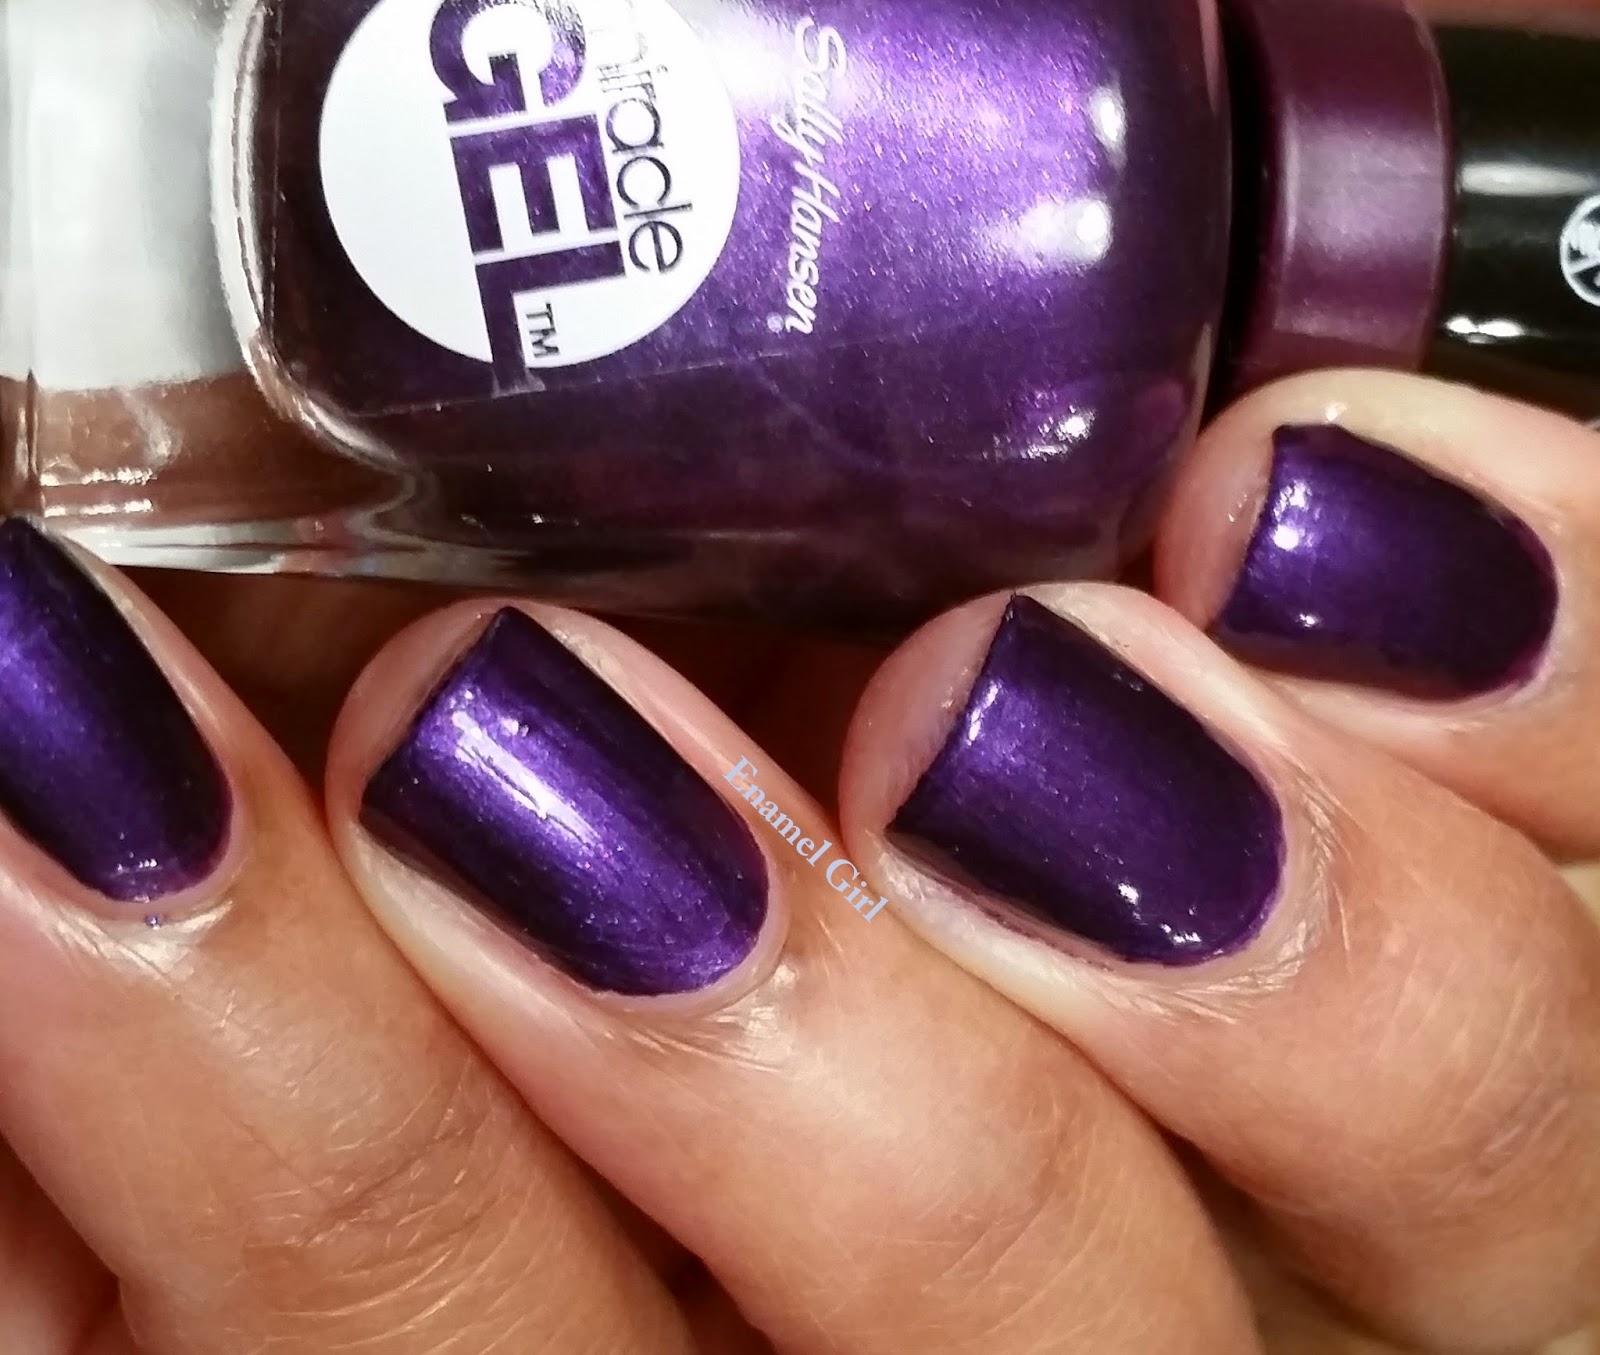 Enamel Girl: Sally Hansen Miracle Gel Review - Purplexed 6 Day Results!